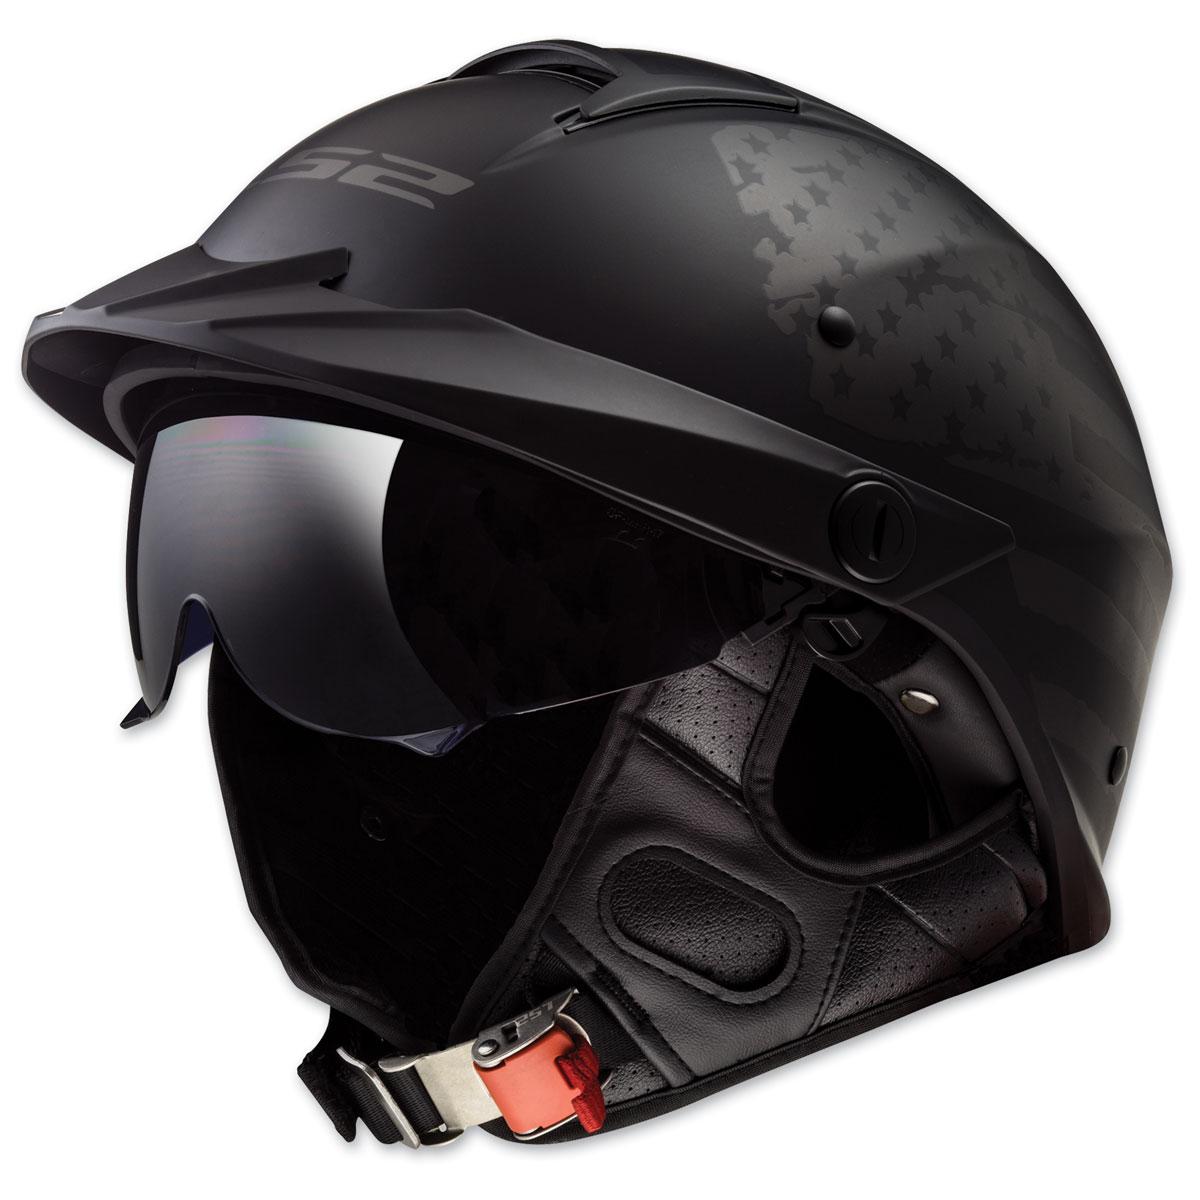 Z1R Ace: DOT approved | Open face motorcycle helmets